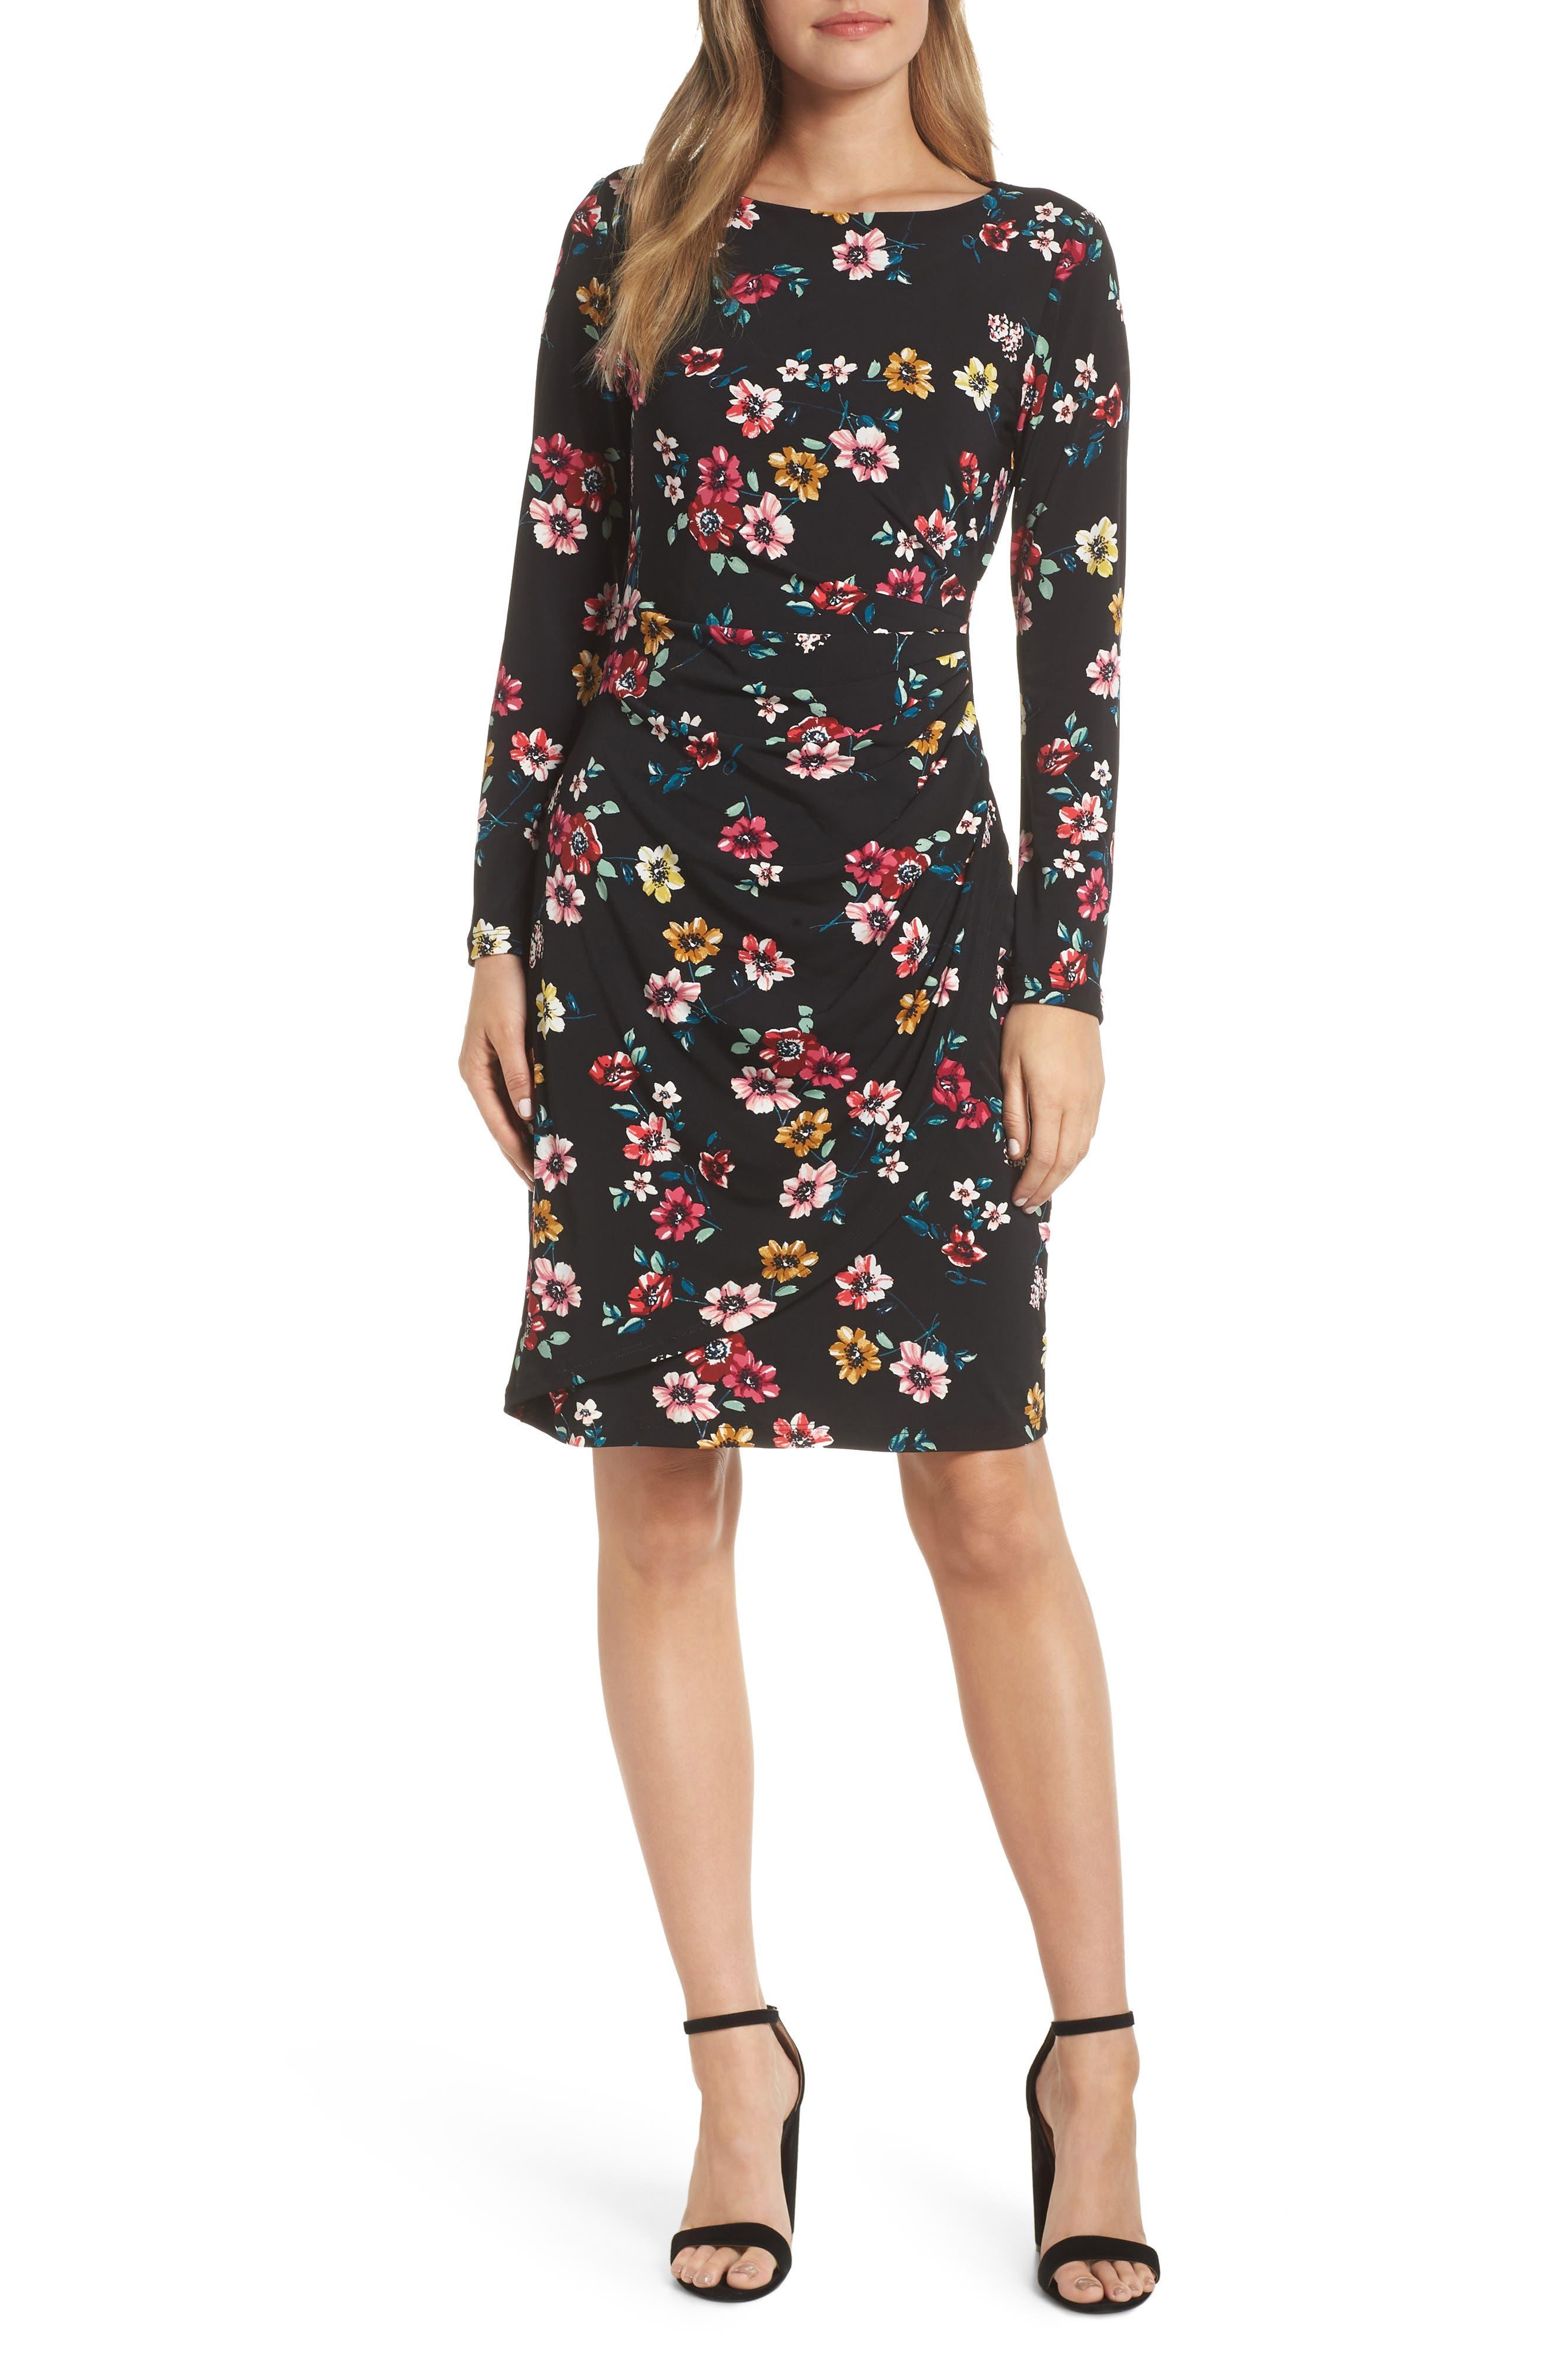 ELIZA J, Floral Sheath Dress, Main thumbnail 1, color, 001